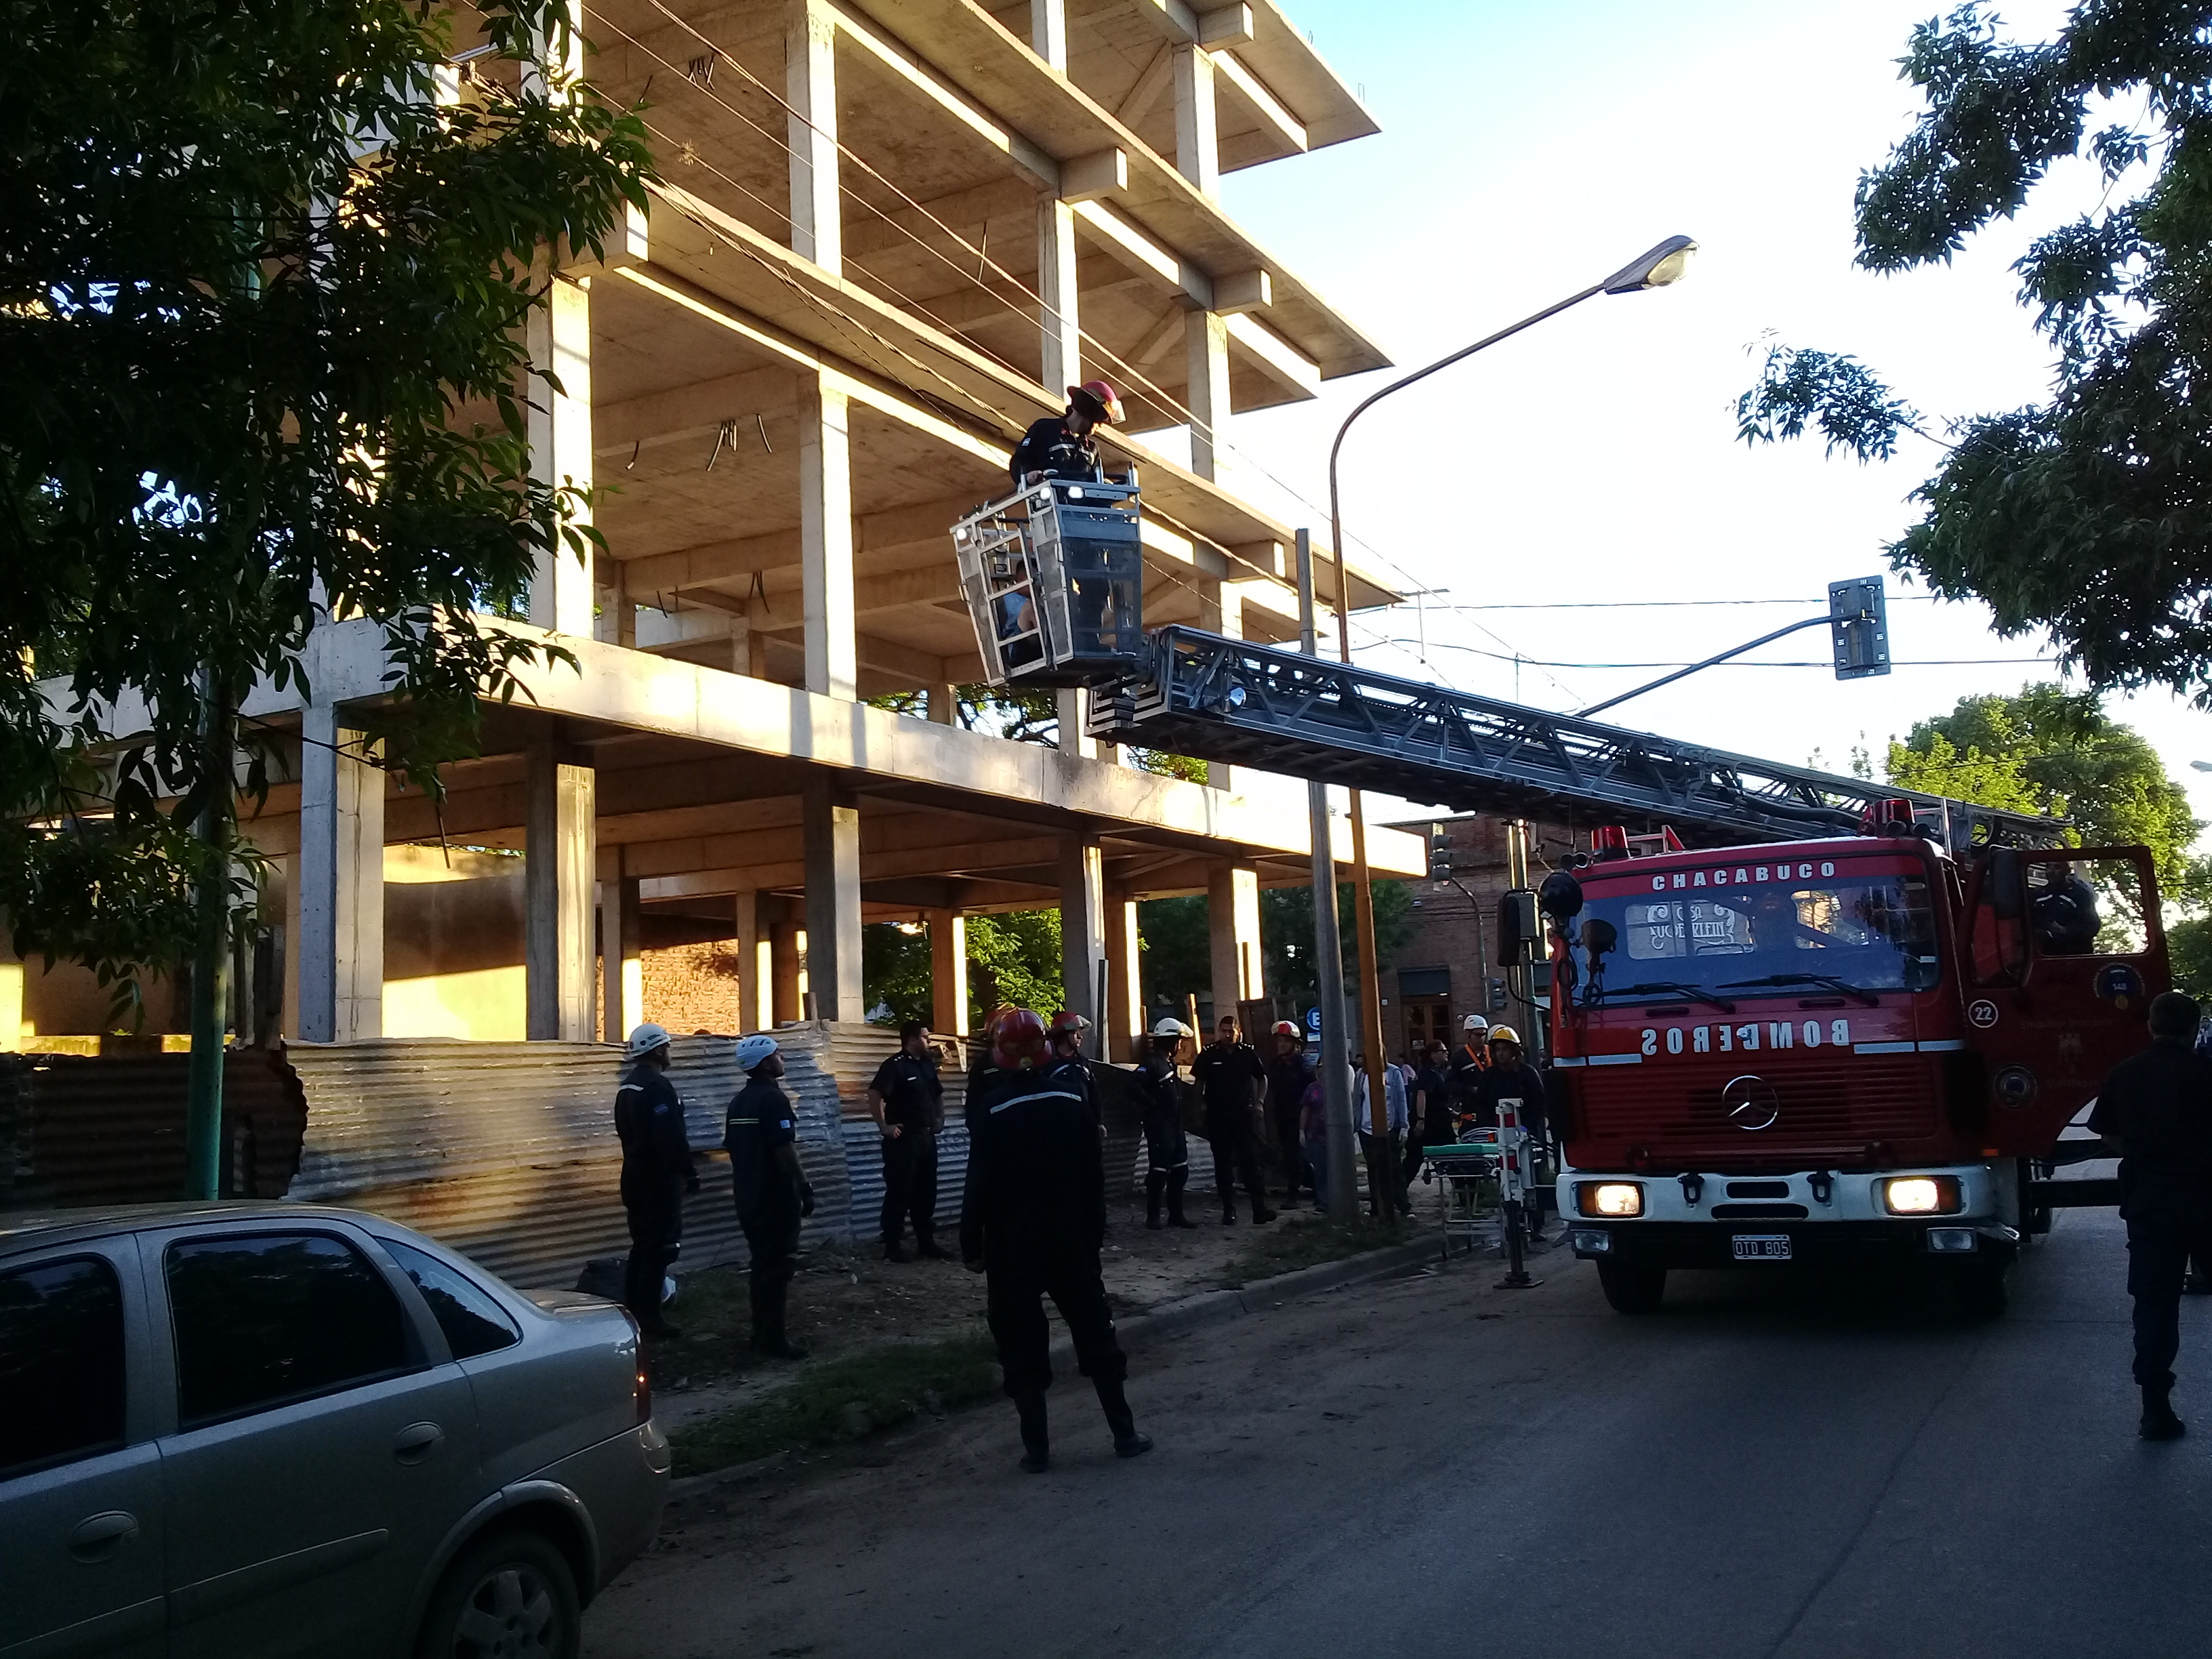 Rescataron a un joven de un edificio en construcción